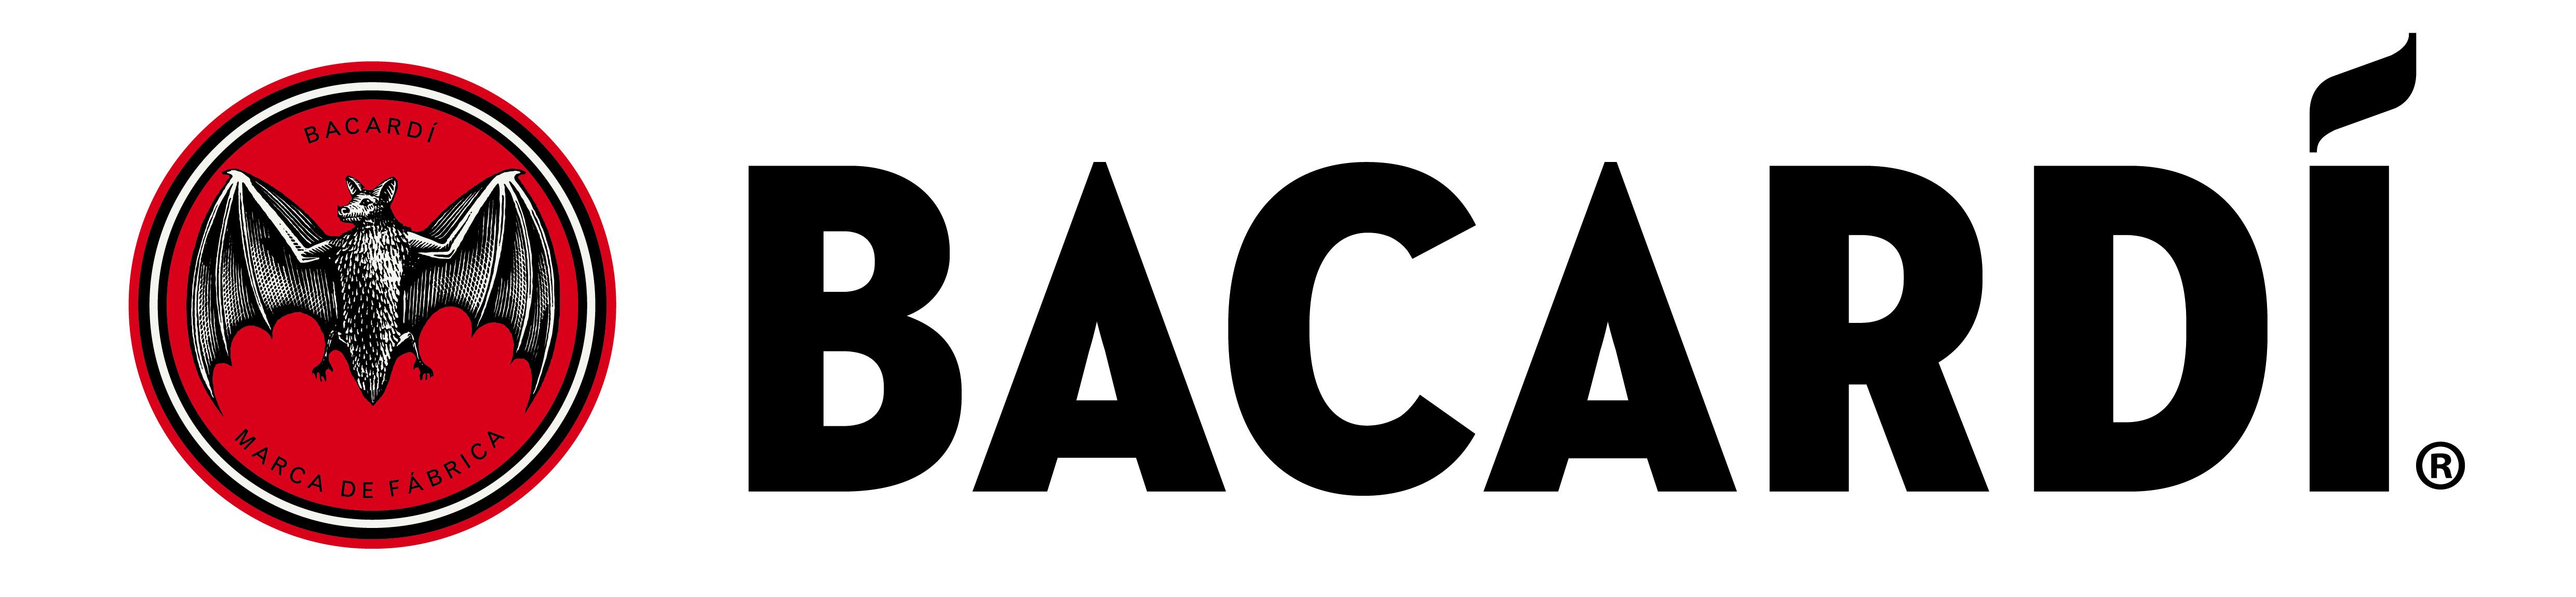 Bacardi secondary logo cmyk